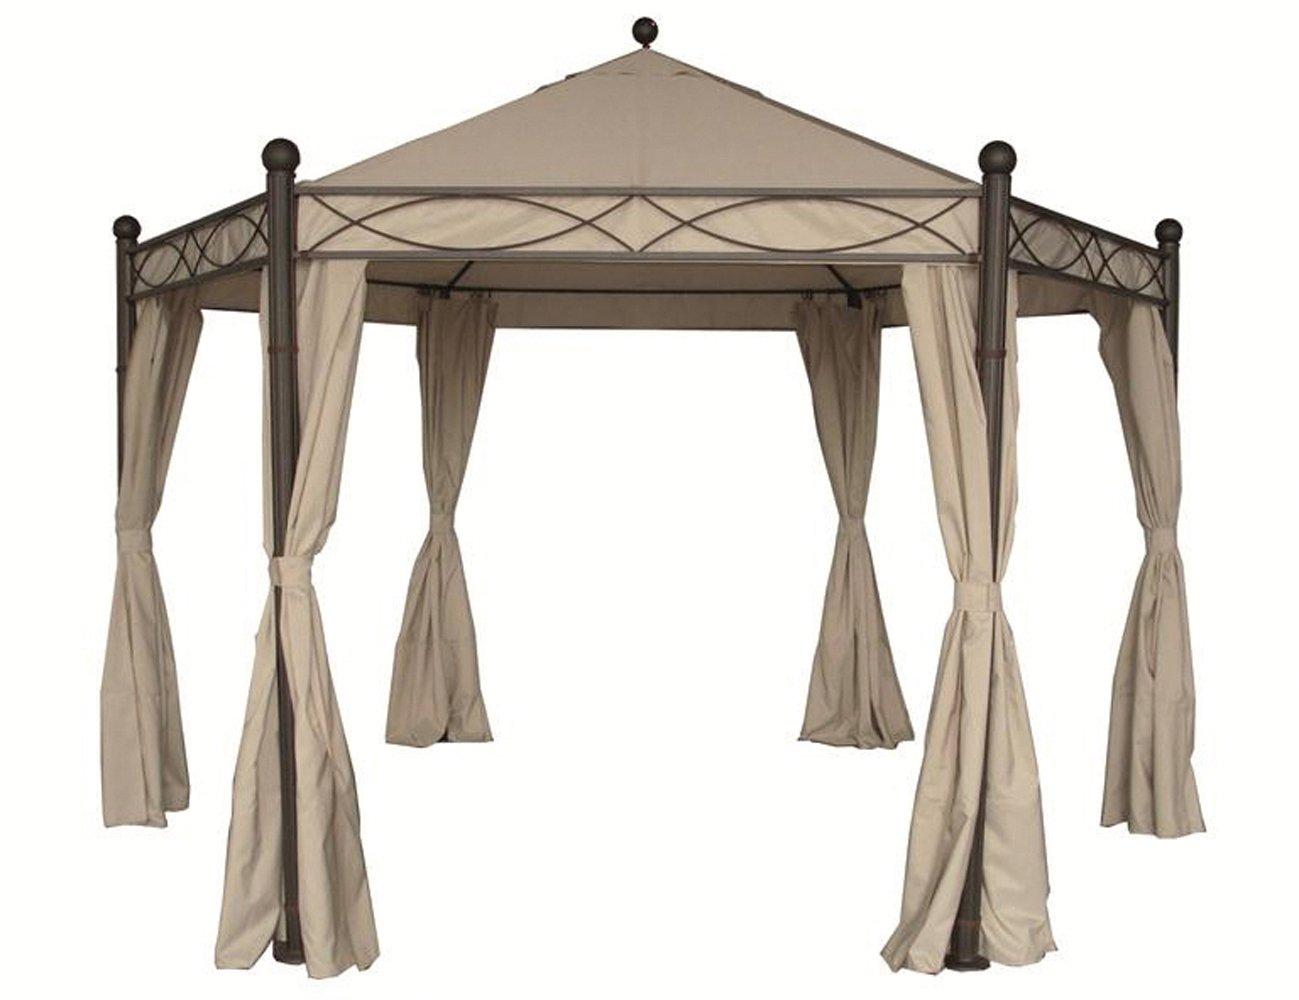 Siena Garden 407826 Seitenteile zu Pavillon Kenia 6eck Polyester natur